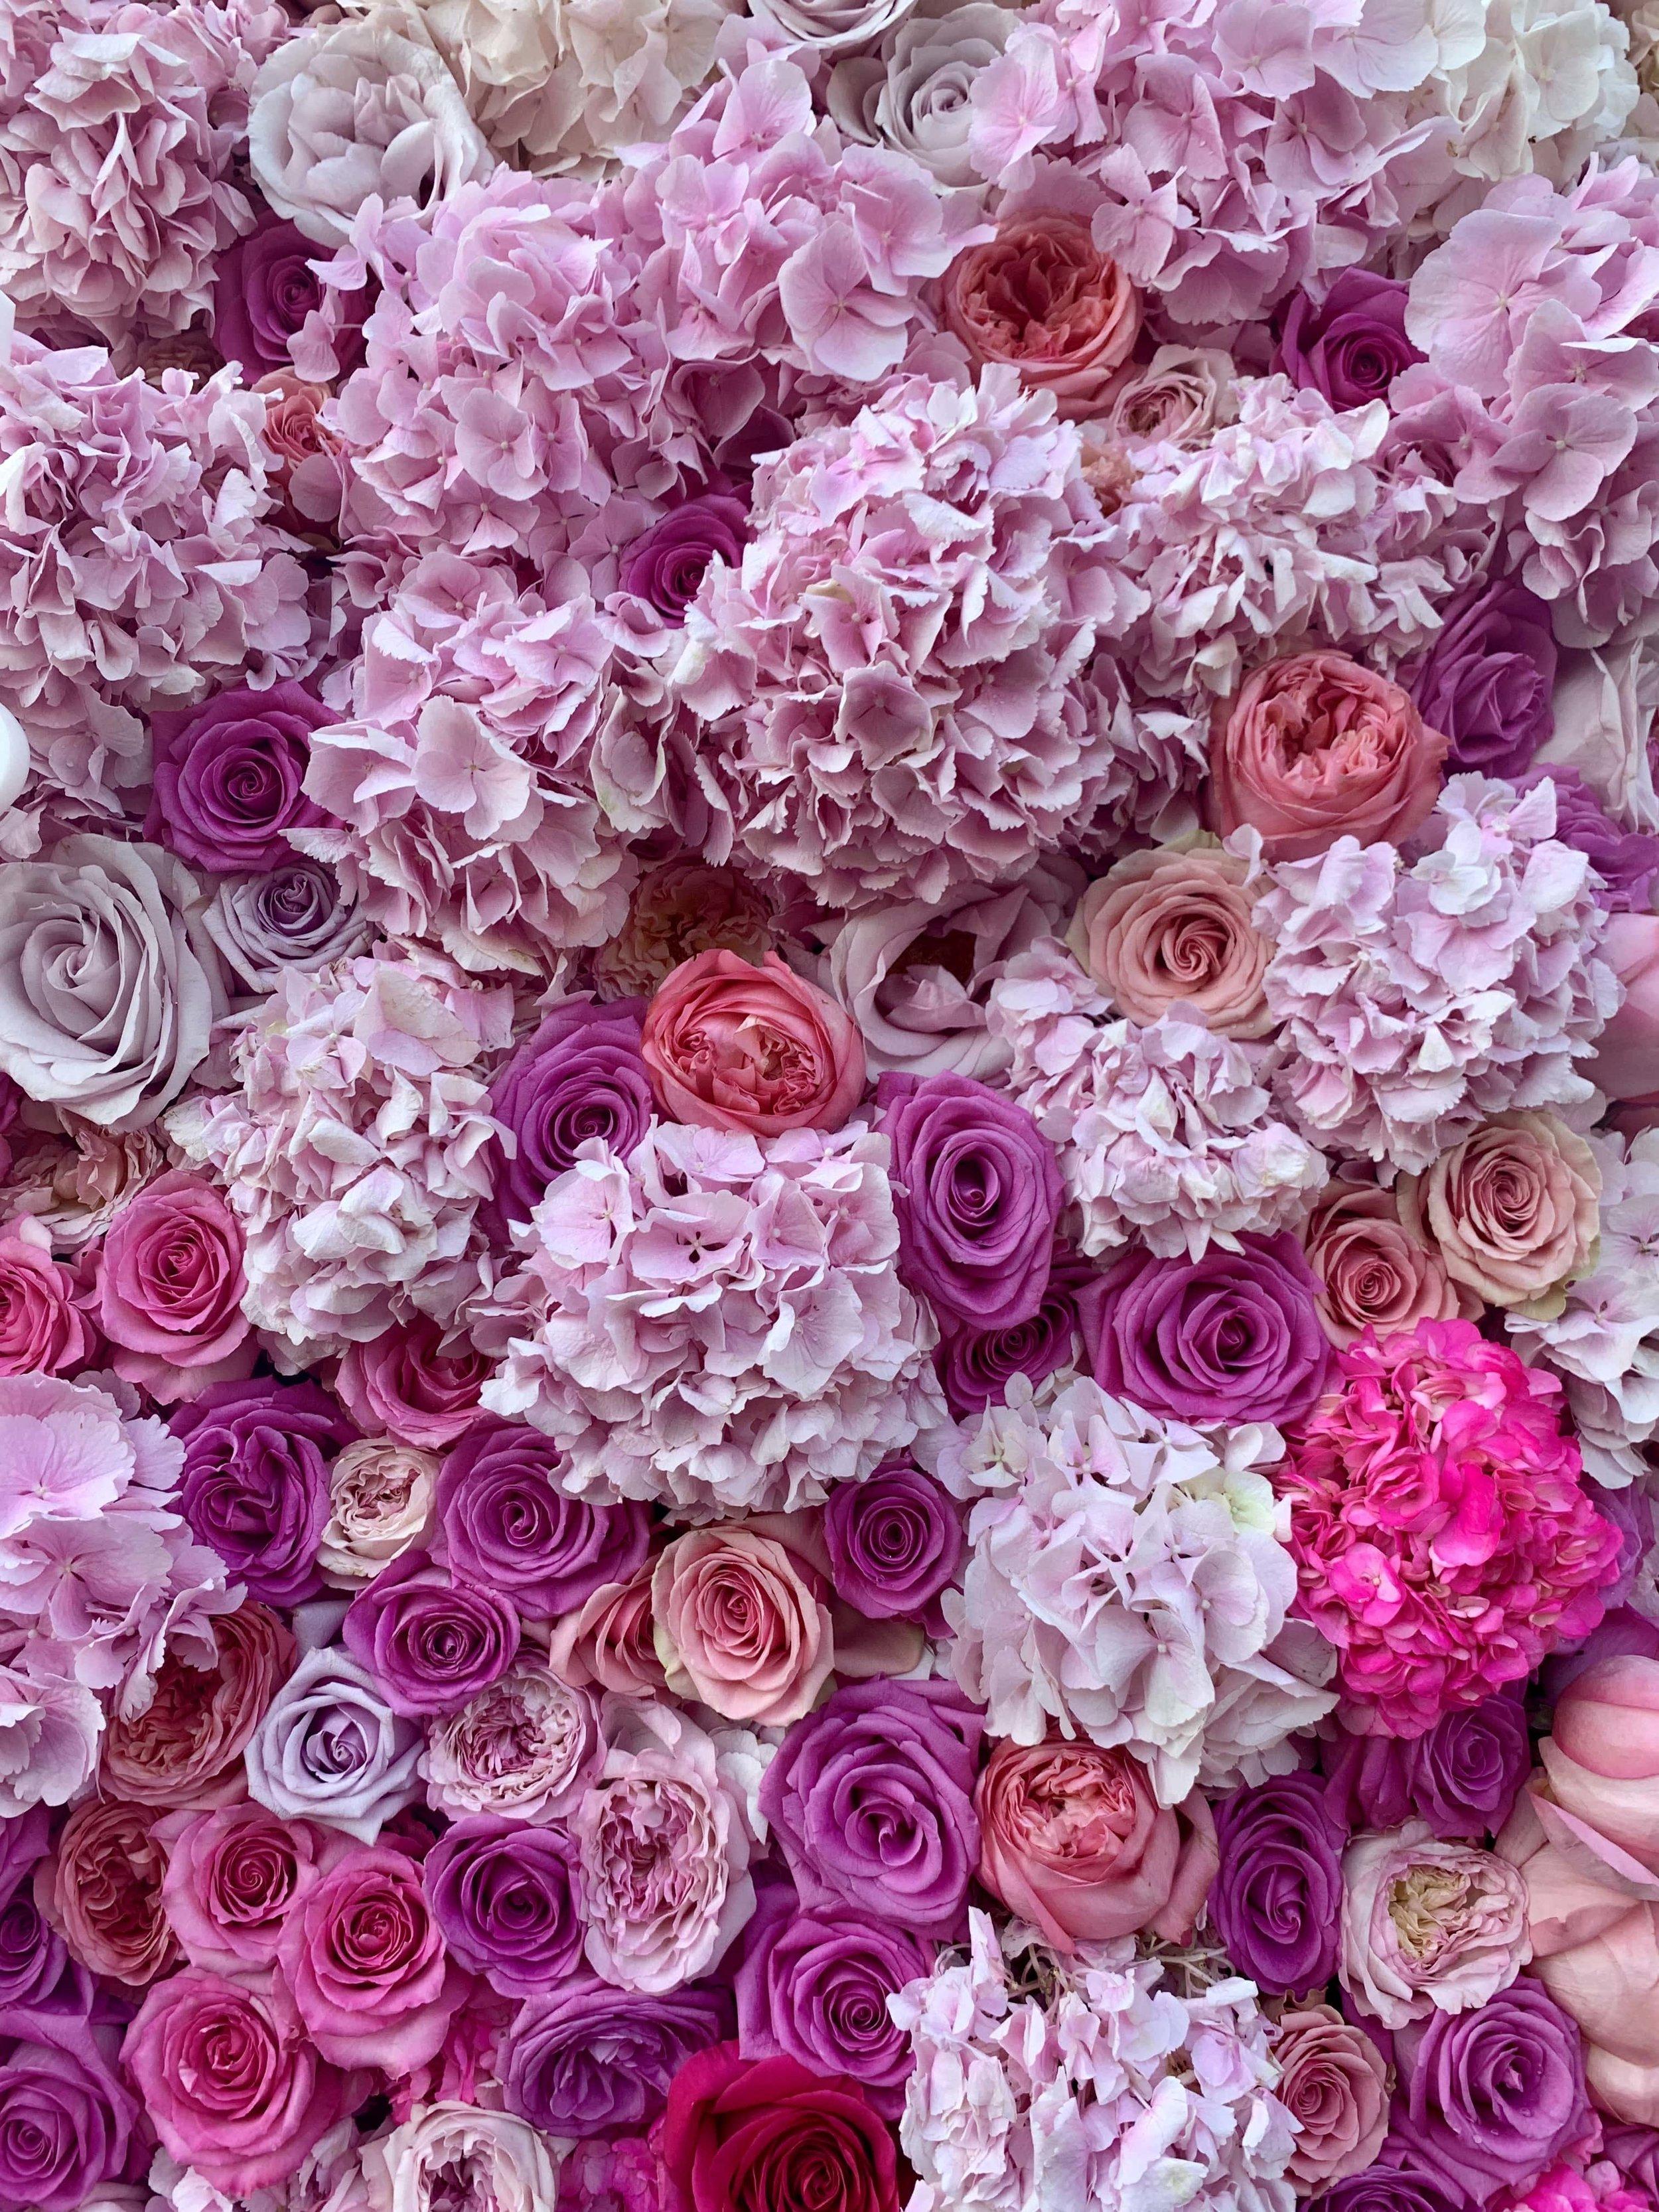 The Marvelous Mrs. Maisel Flower Wall Details